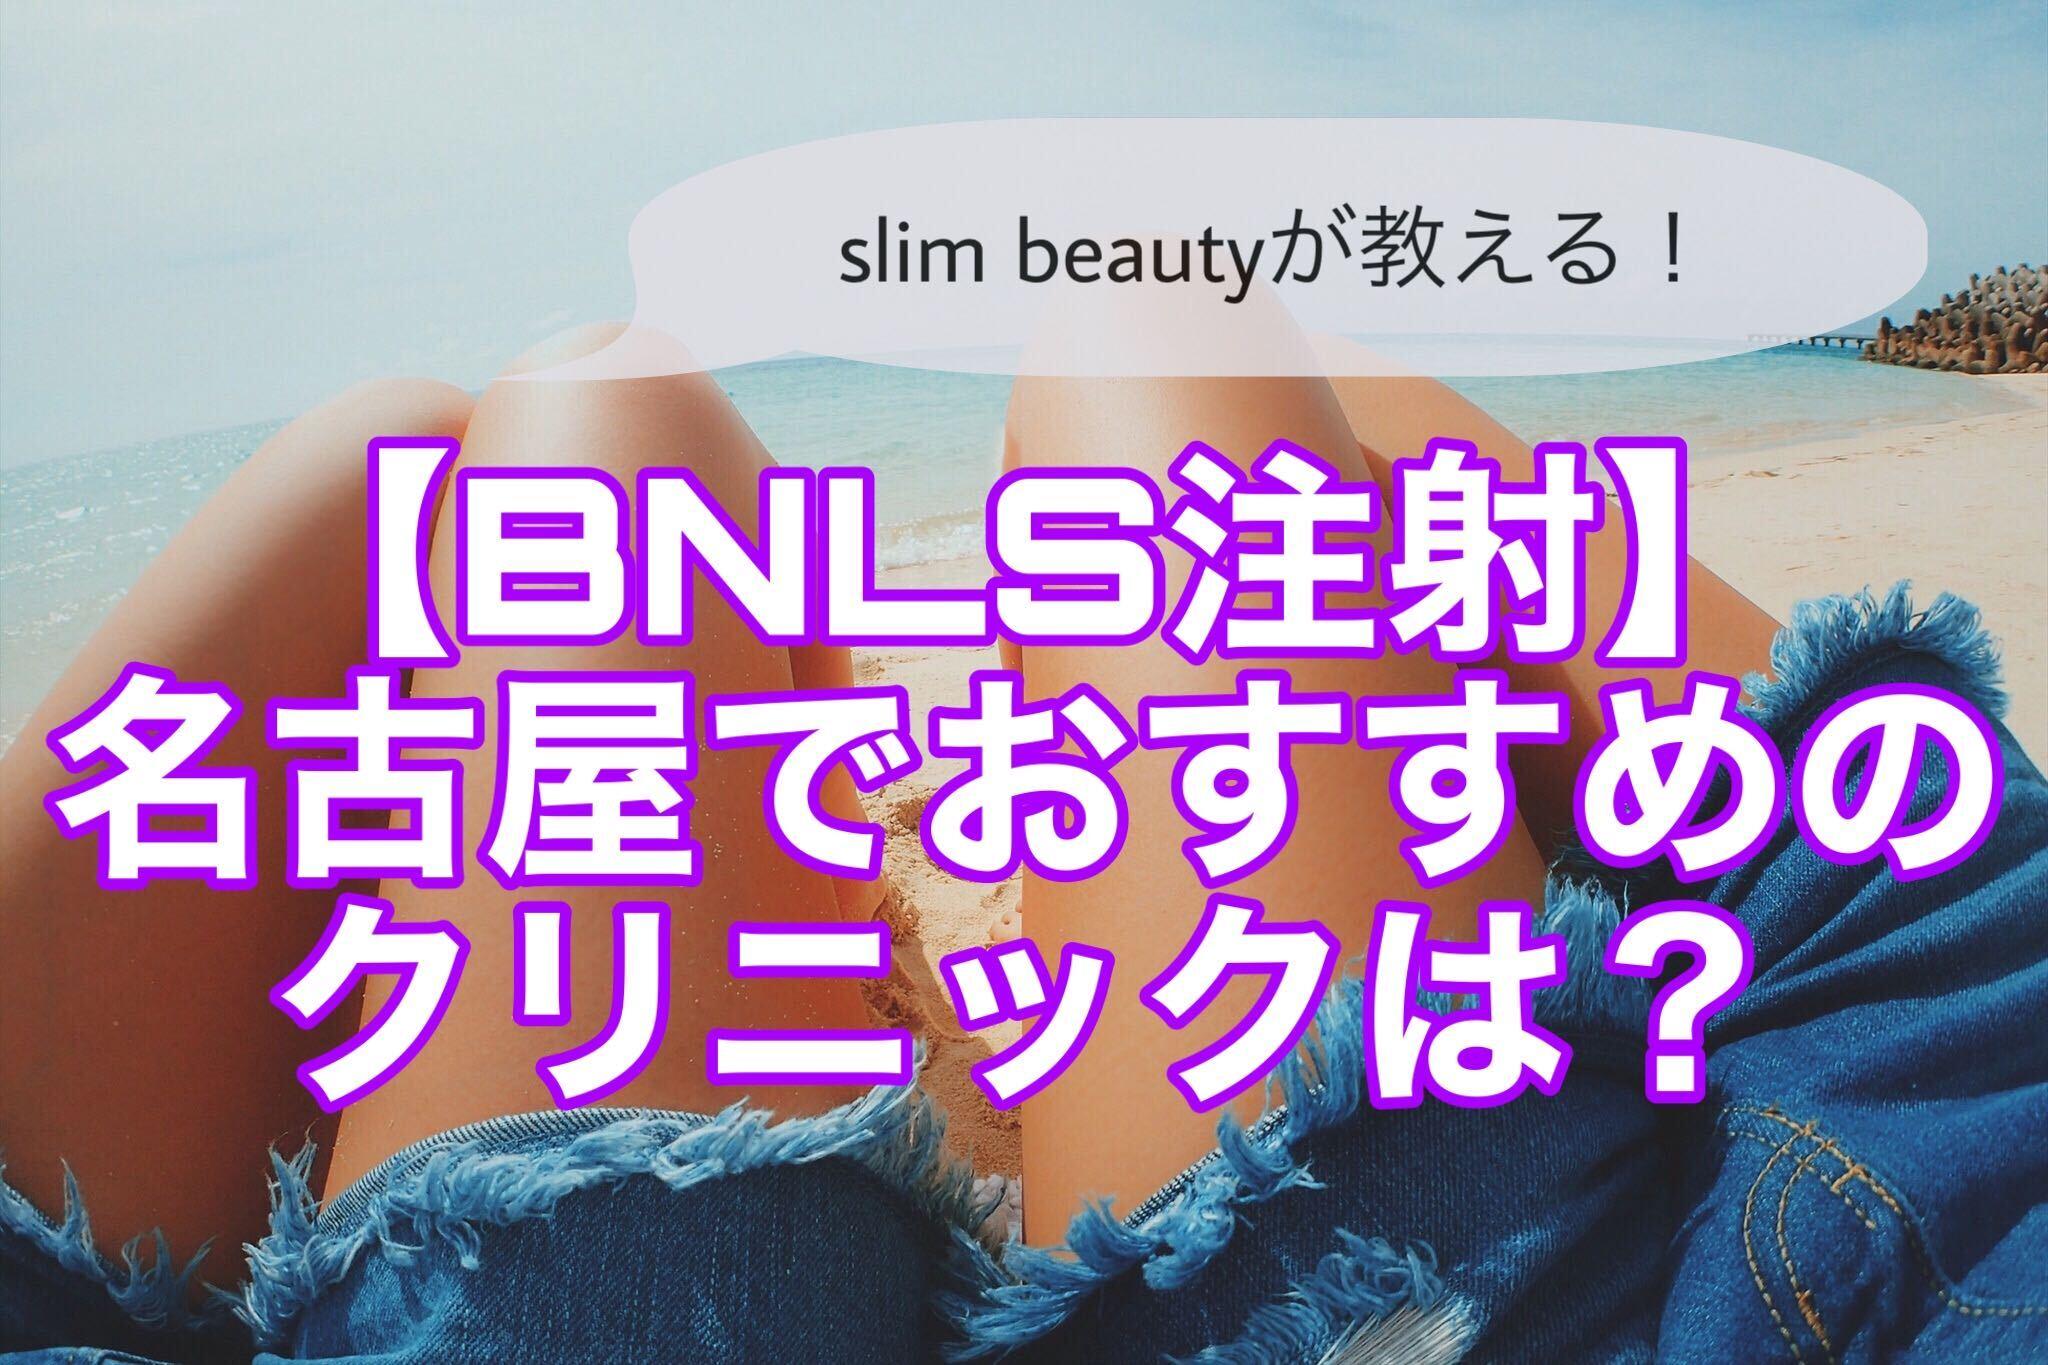 BNLS名古屋